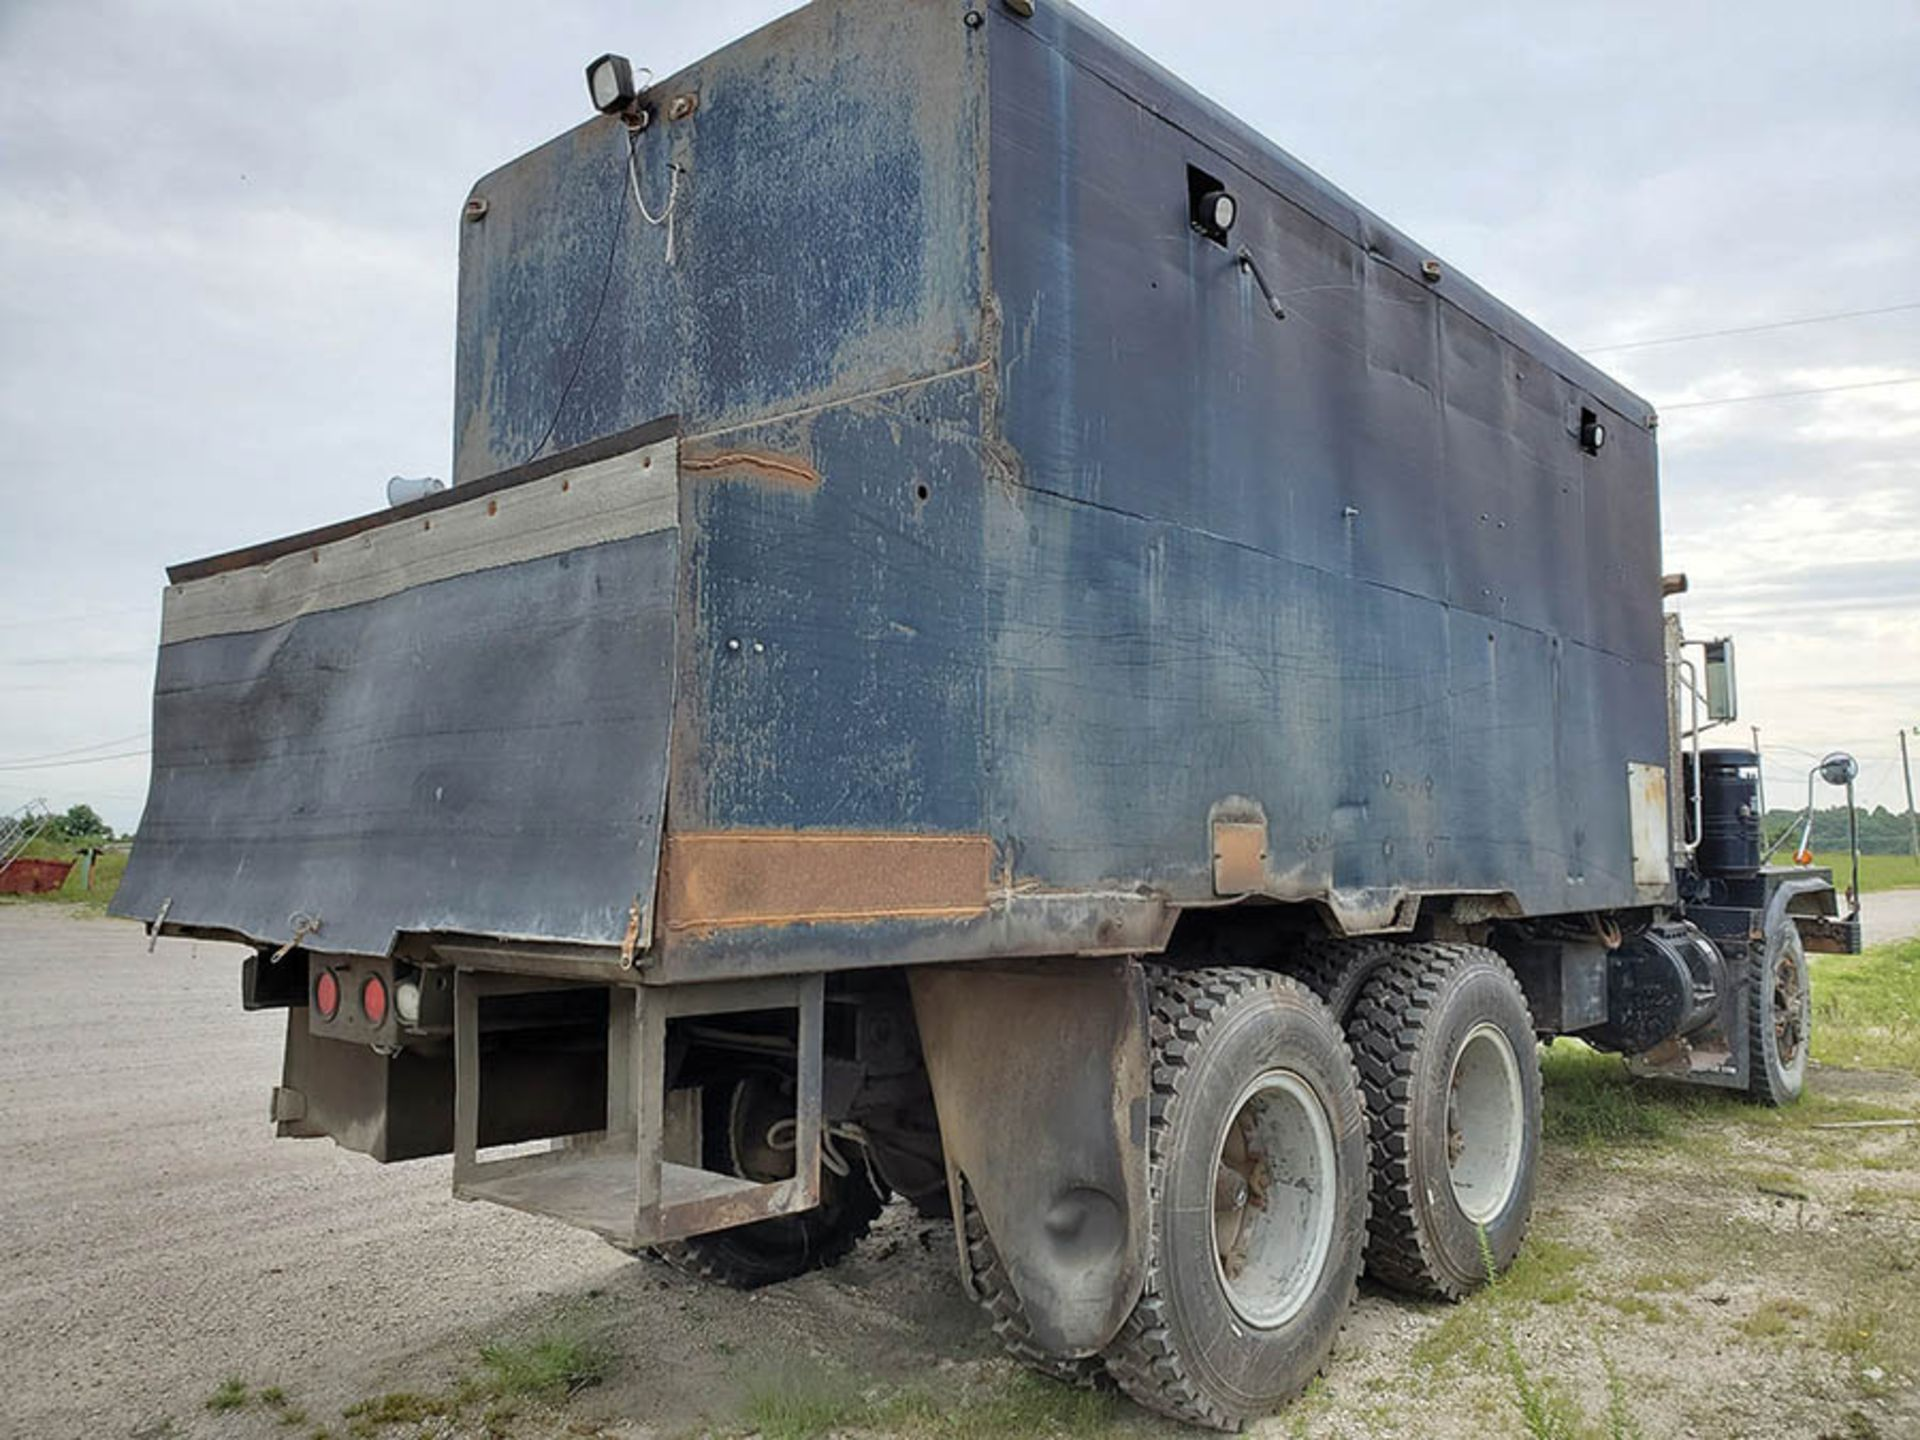 Lot 43 - 1994 MACK RD890 SX T/A LUBE TRUCK, EATON FULLER TRANSMISSION, MACK INLINE SIX ENGINE, 228,302 MILES,